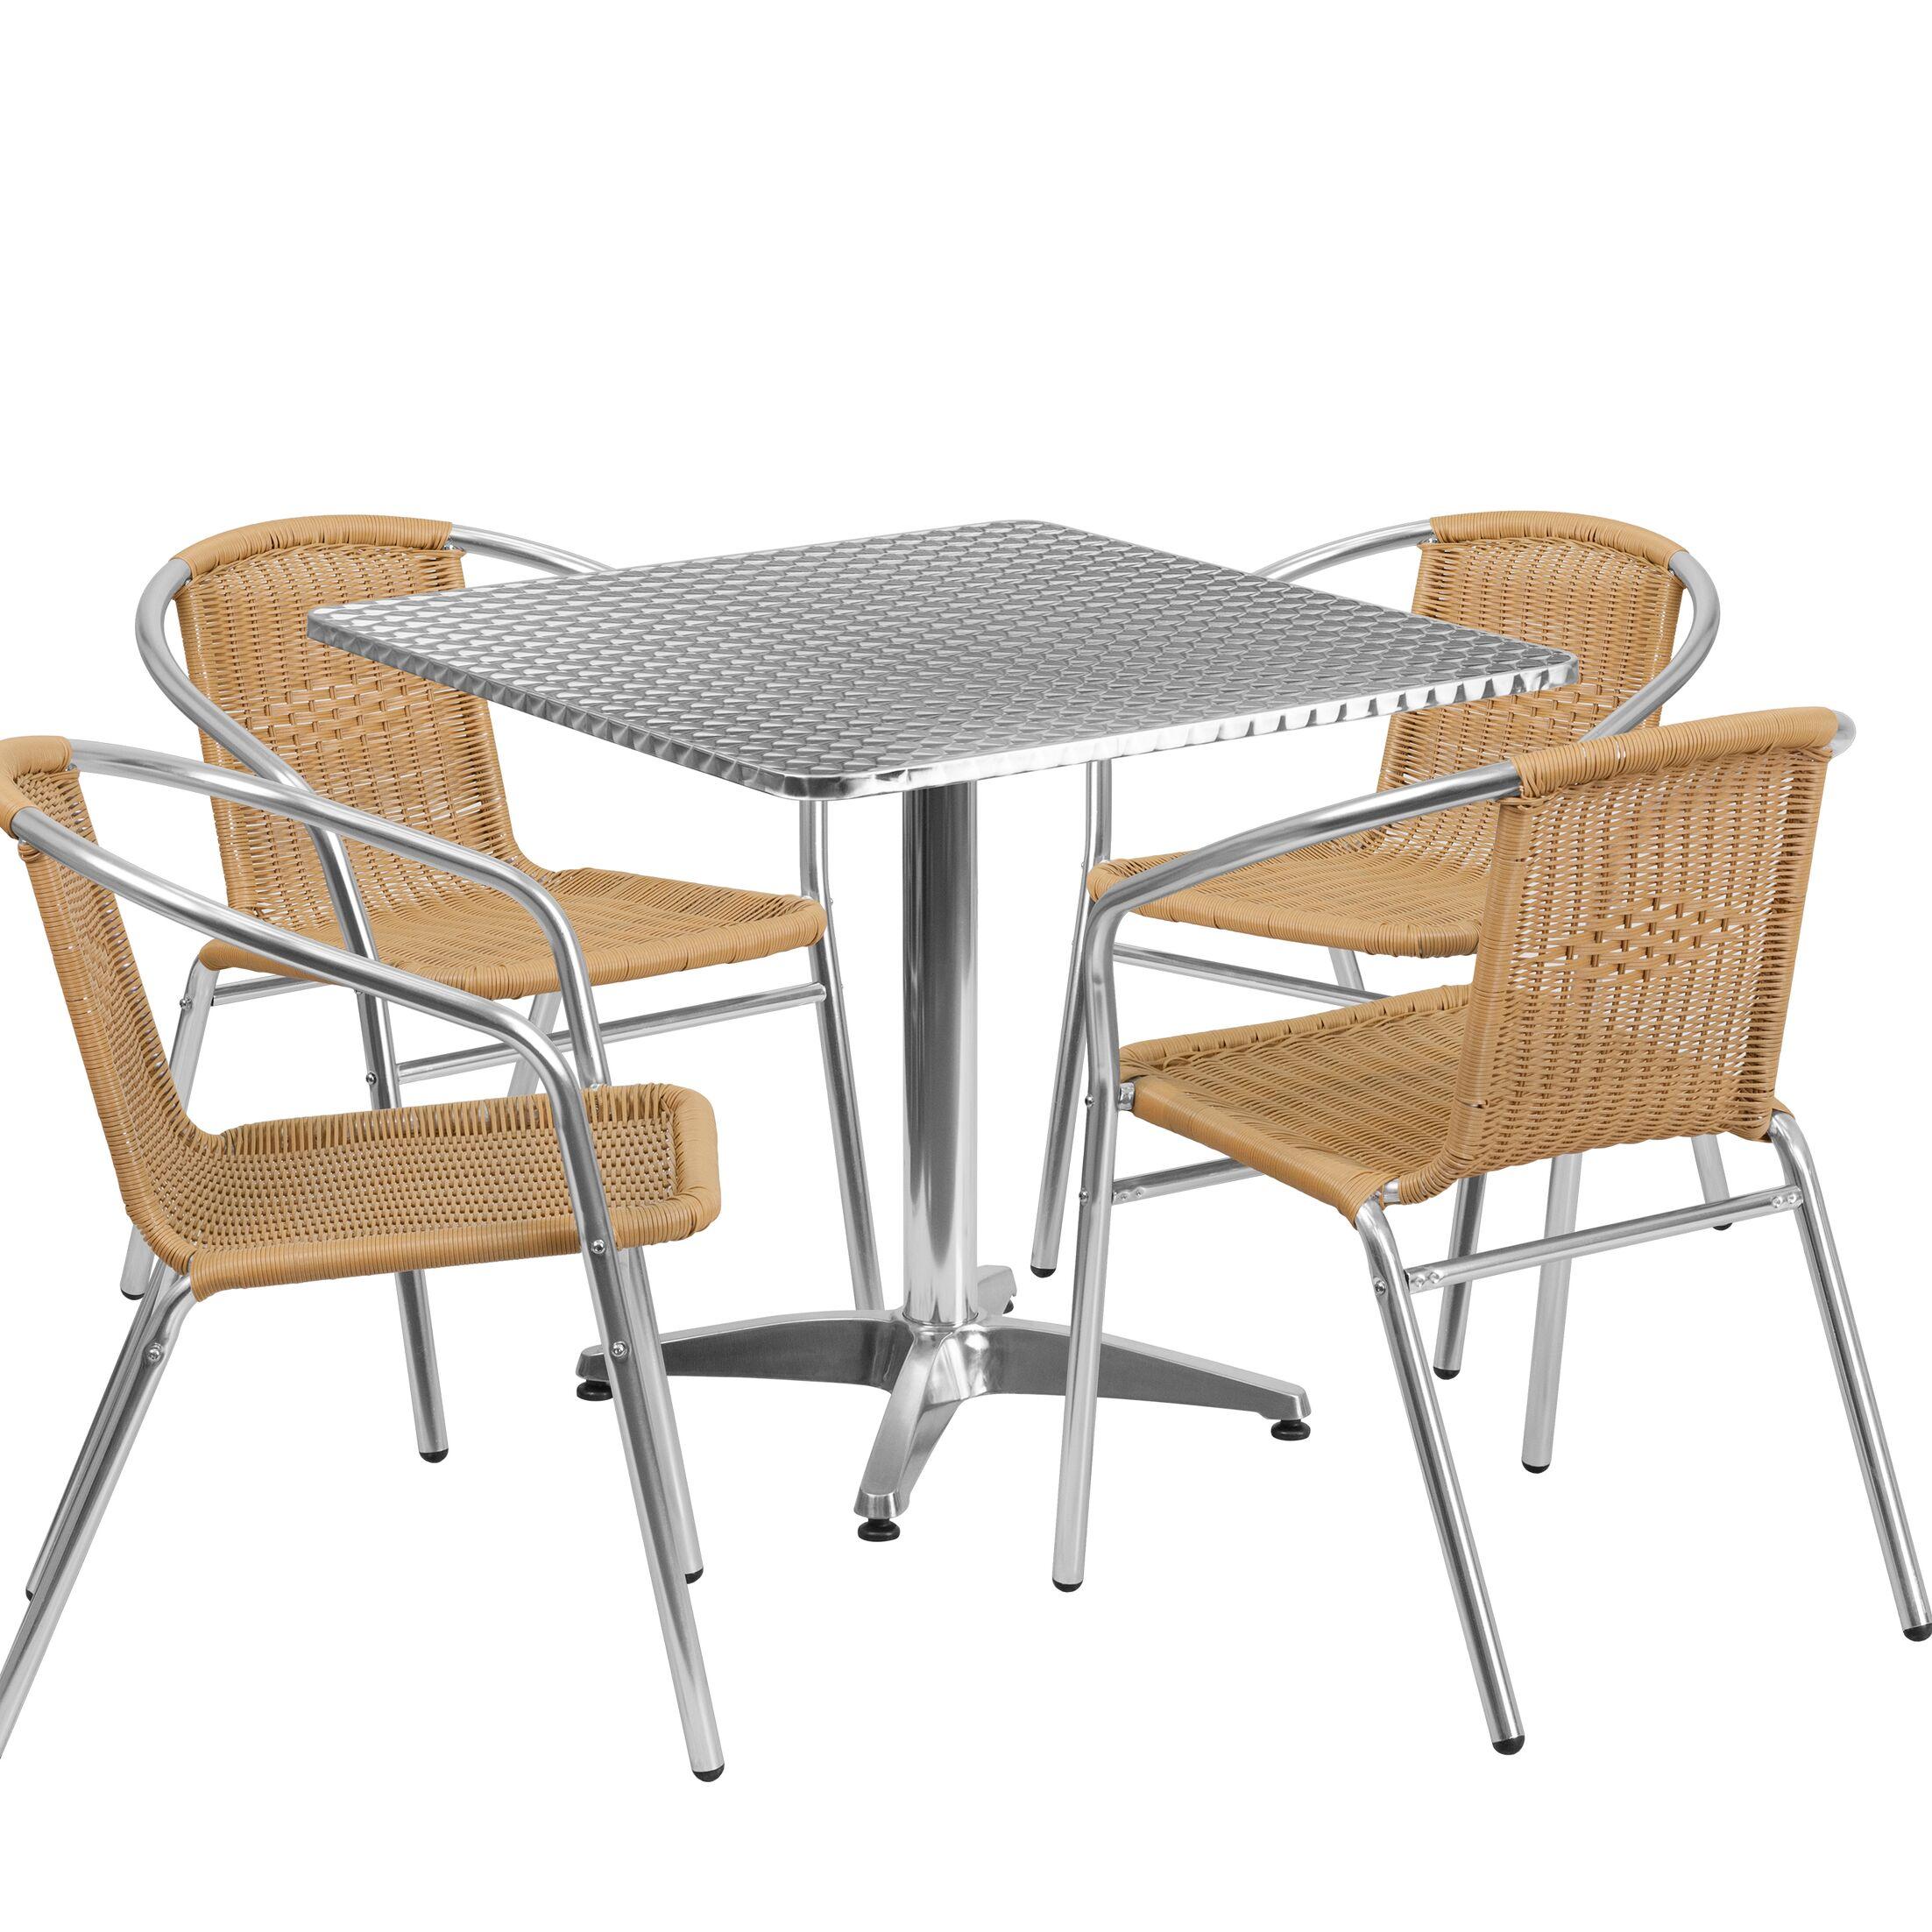 Komal 5 Piece Dining Set Finish: Black, Table Size: 27.5